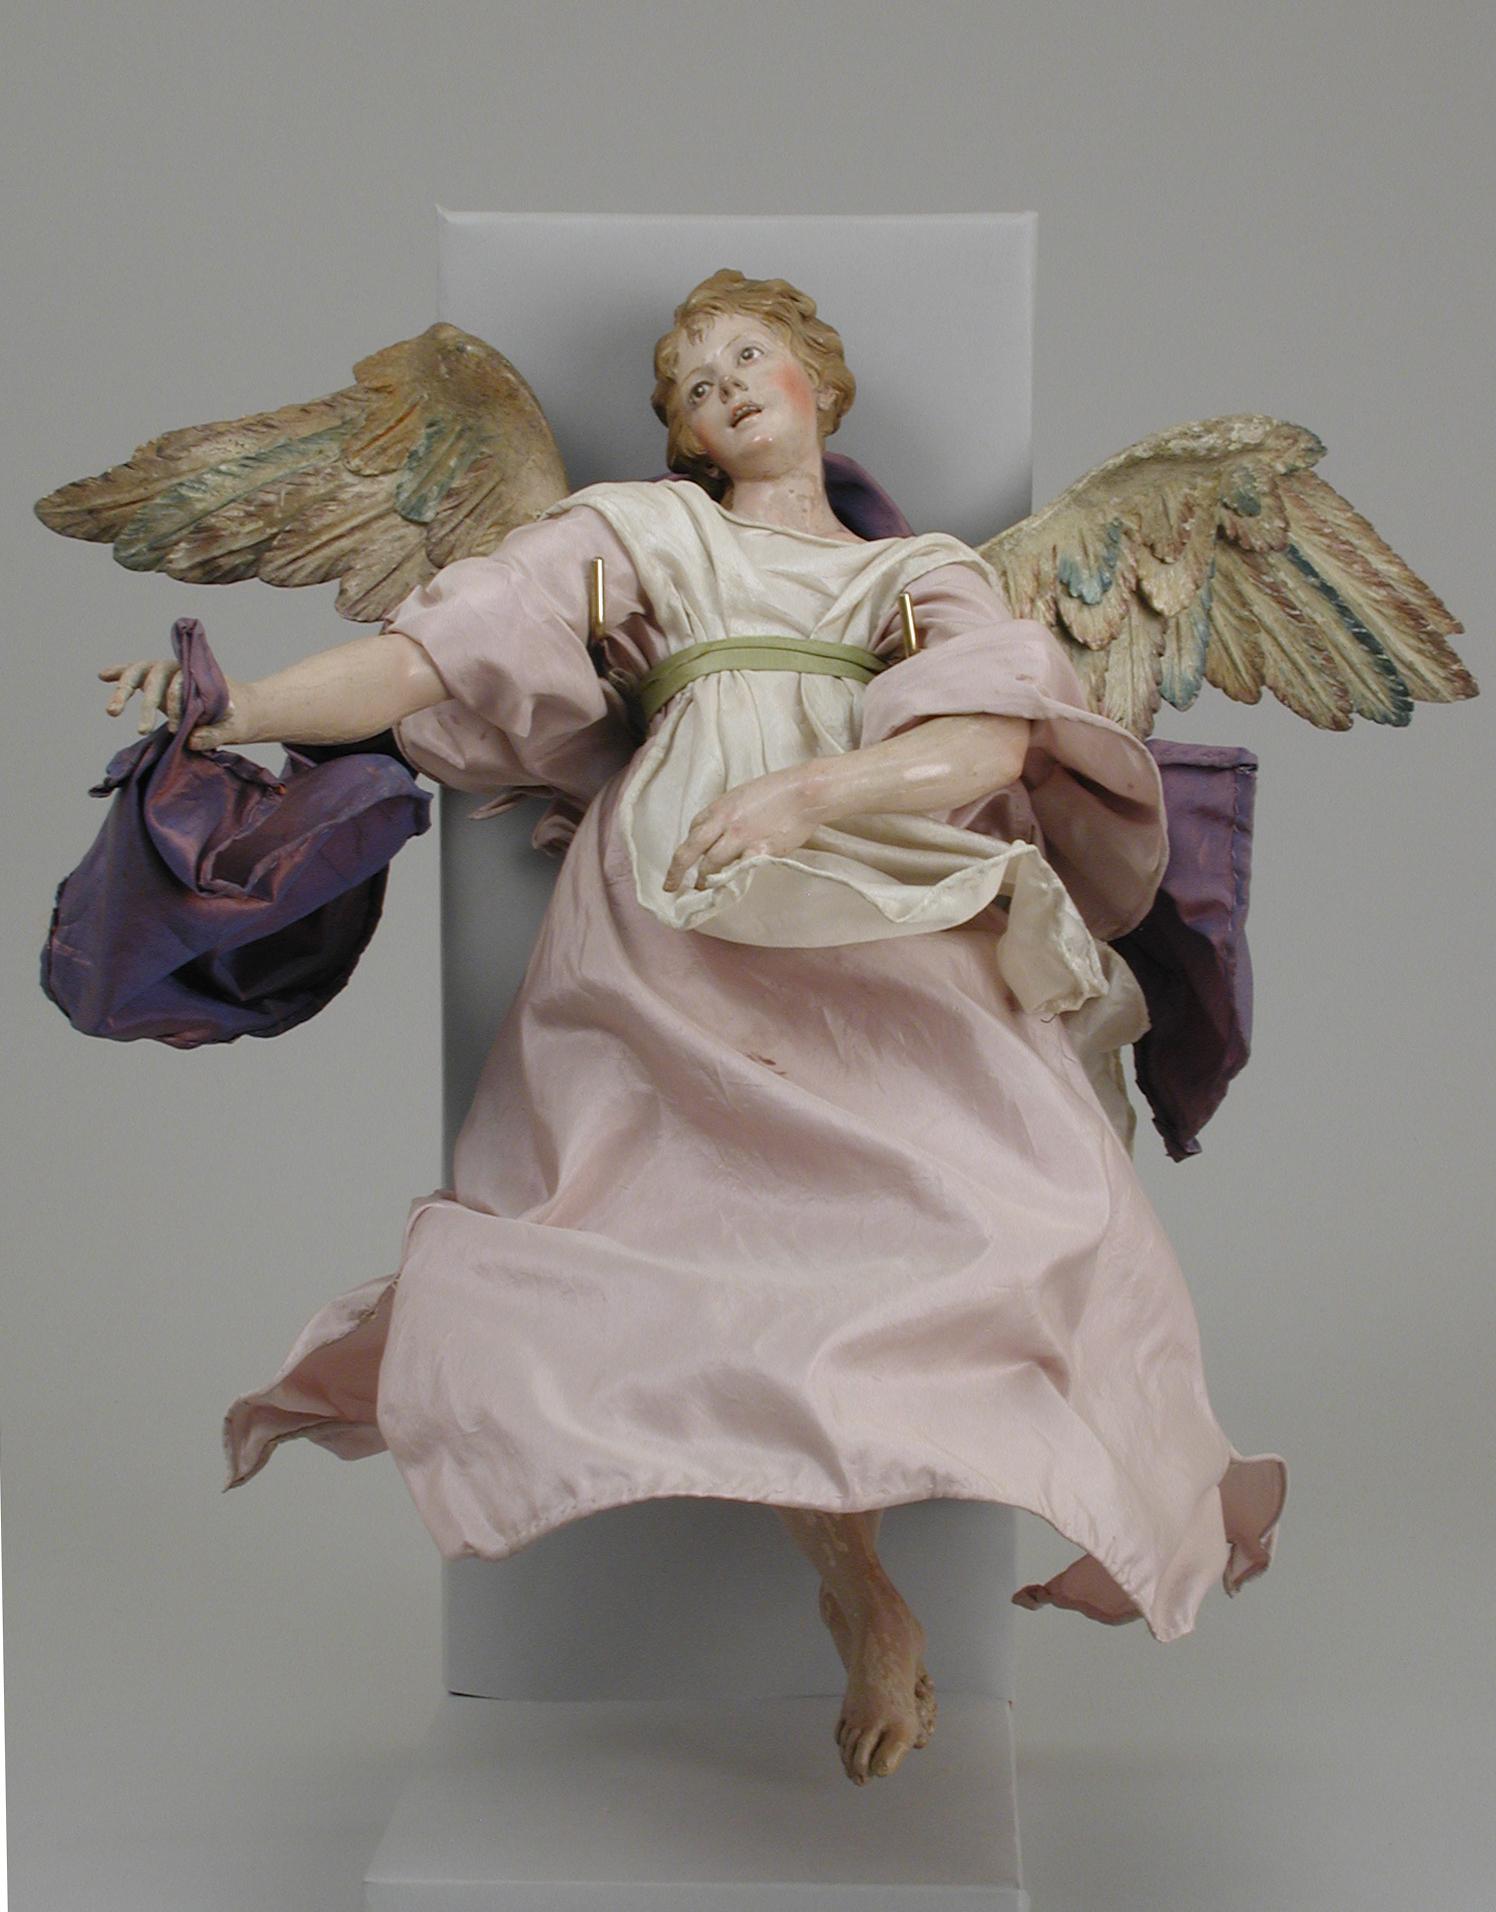 https://images.metmuseum.org/CRDImages/es/original/LC-64_164_10.jpg